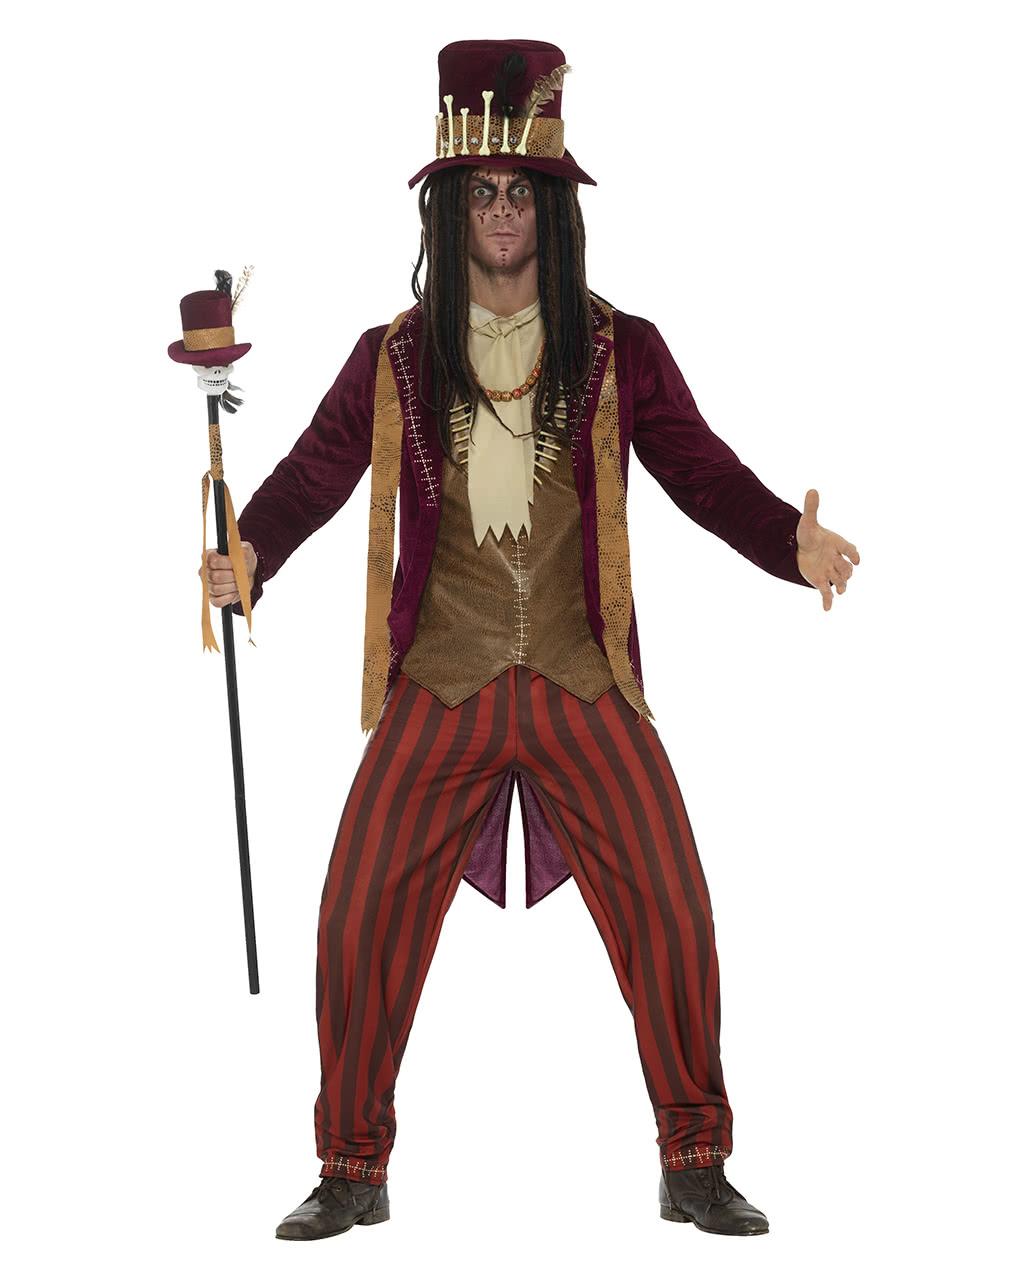 voodoo witch doctor costume deluxe for halloween horror. Black Bedroom Furniture Sets. Home Design Ideas